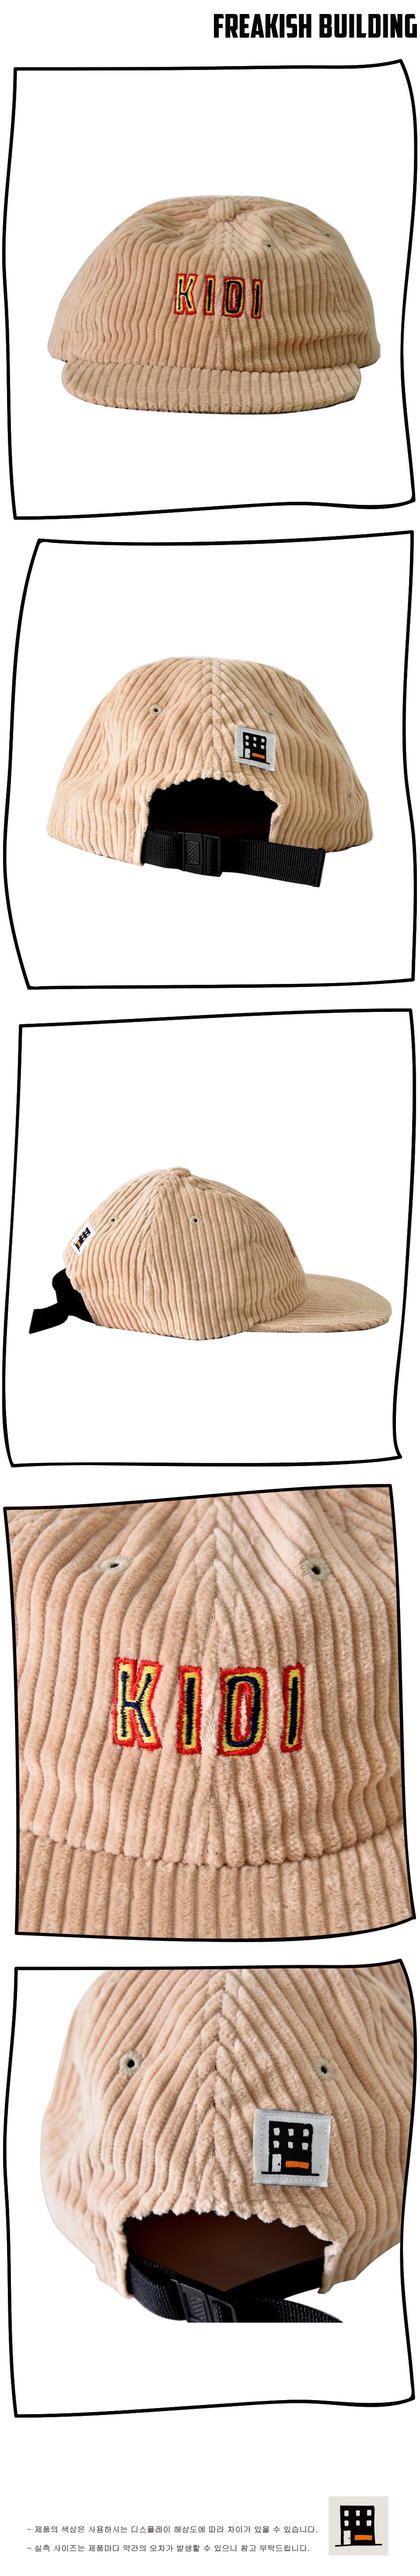 #31 KIDI CORDUROY FLAT CAP (BEIGE) 03.jpg